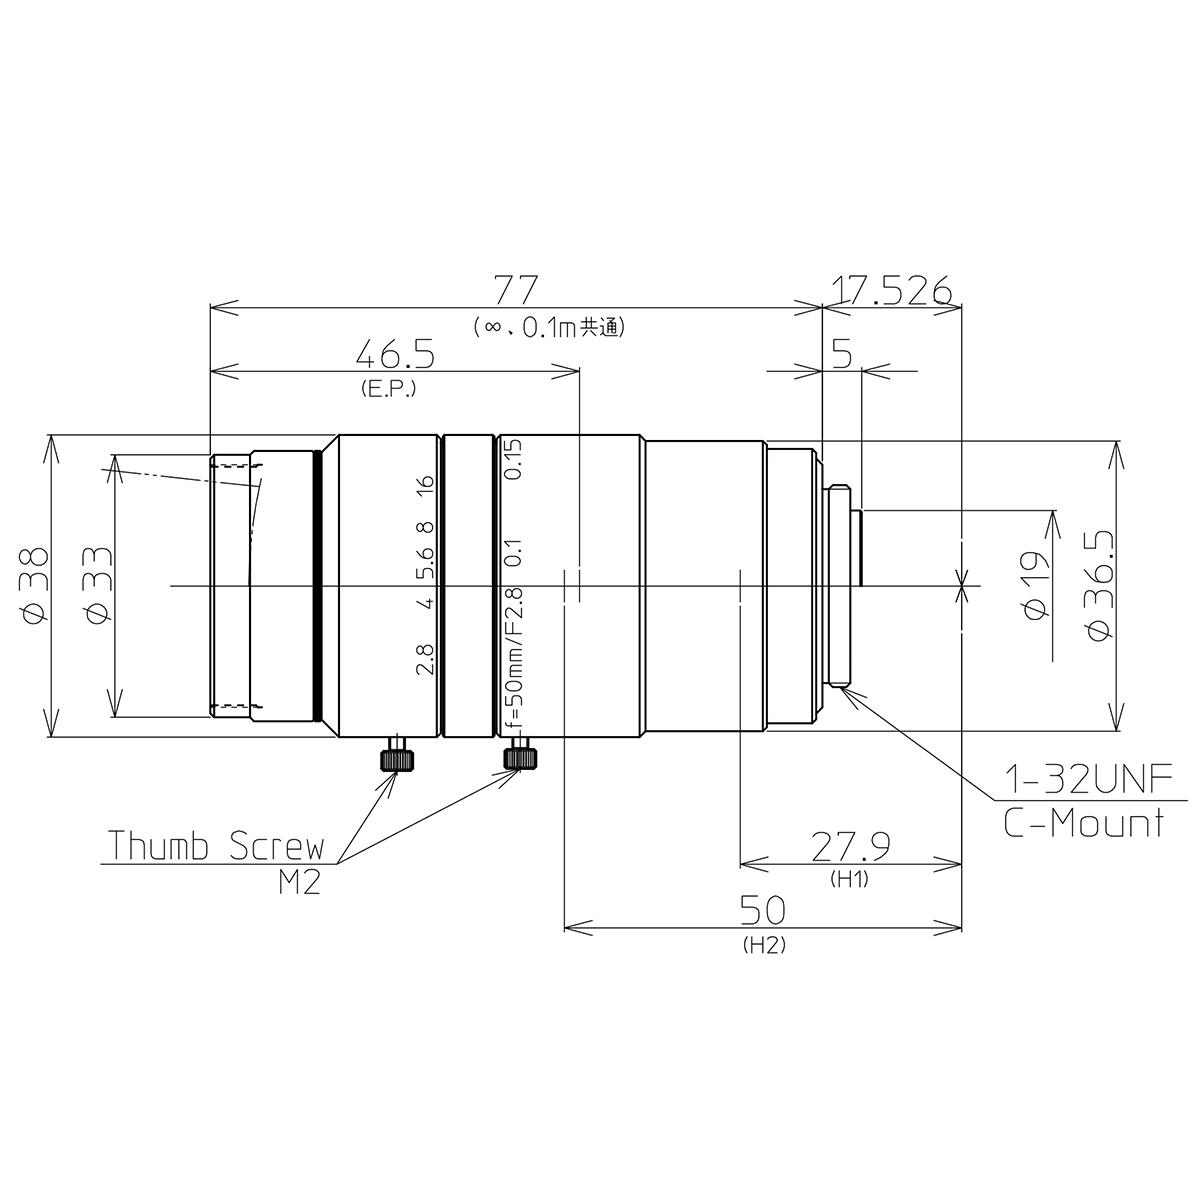 Kowa LM50JC10M lens drawing